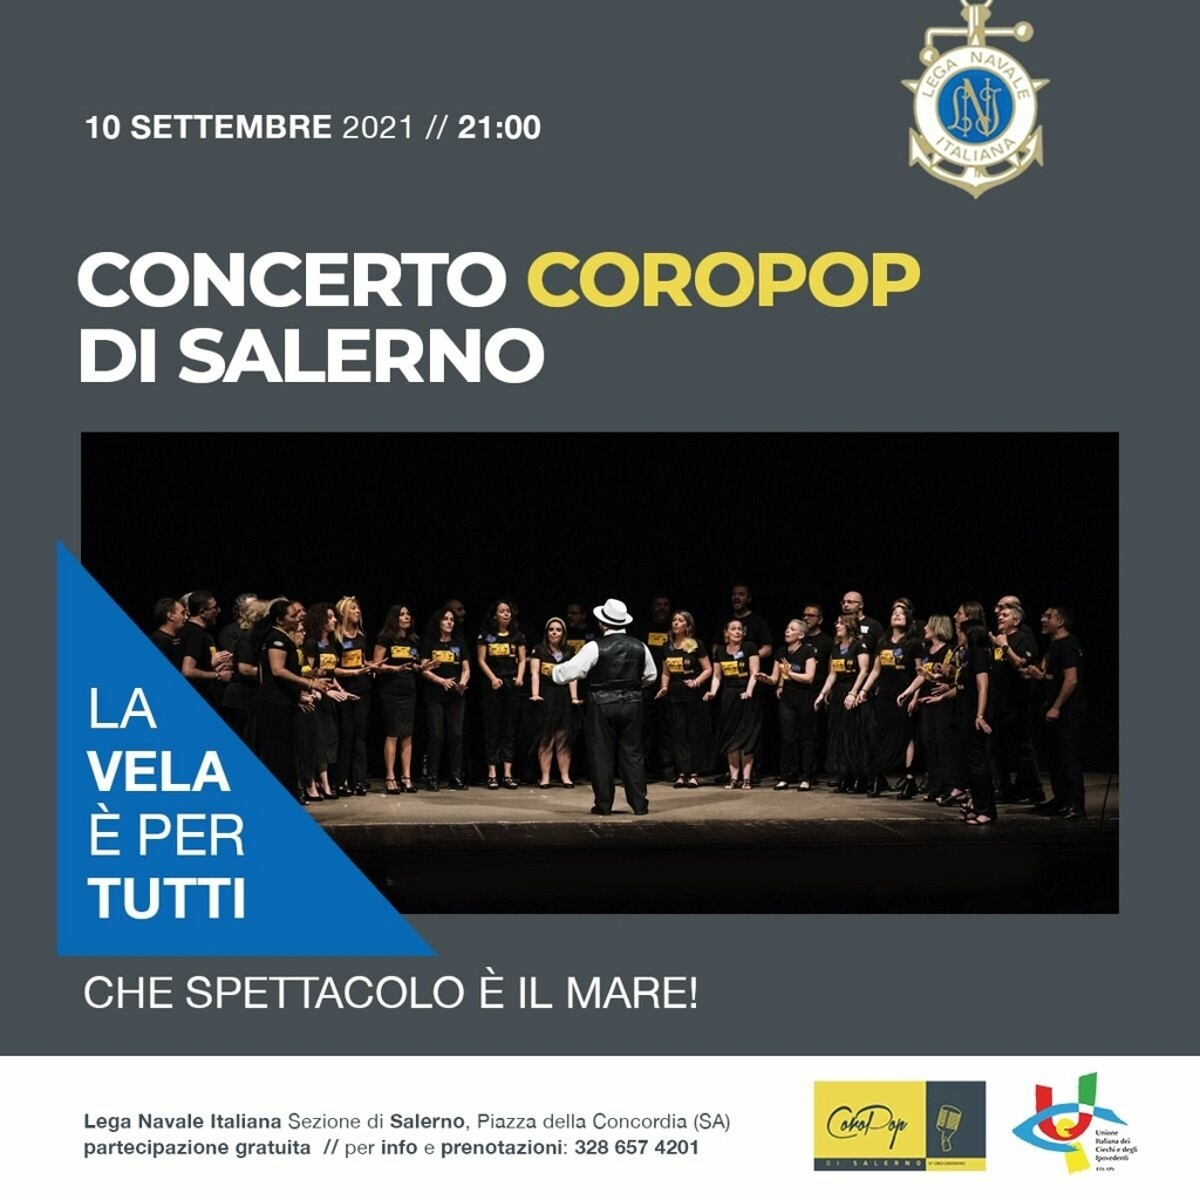 Concerto Coropop di Salerno: l'appuntamento